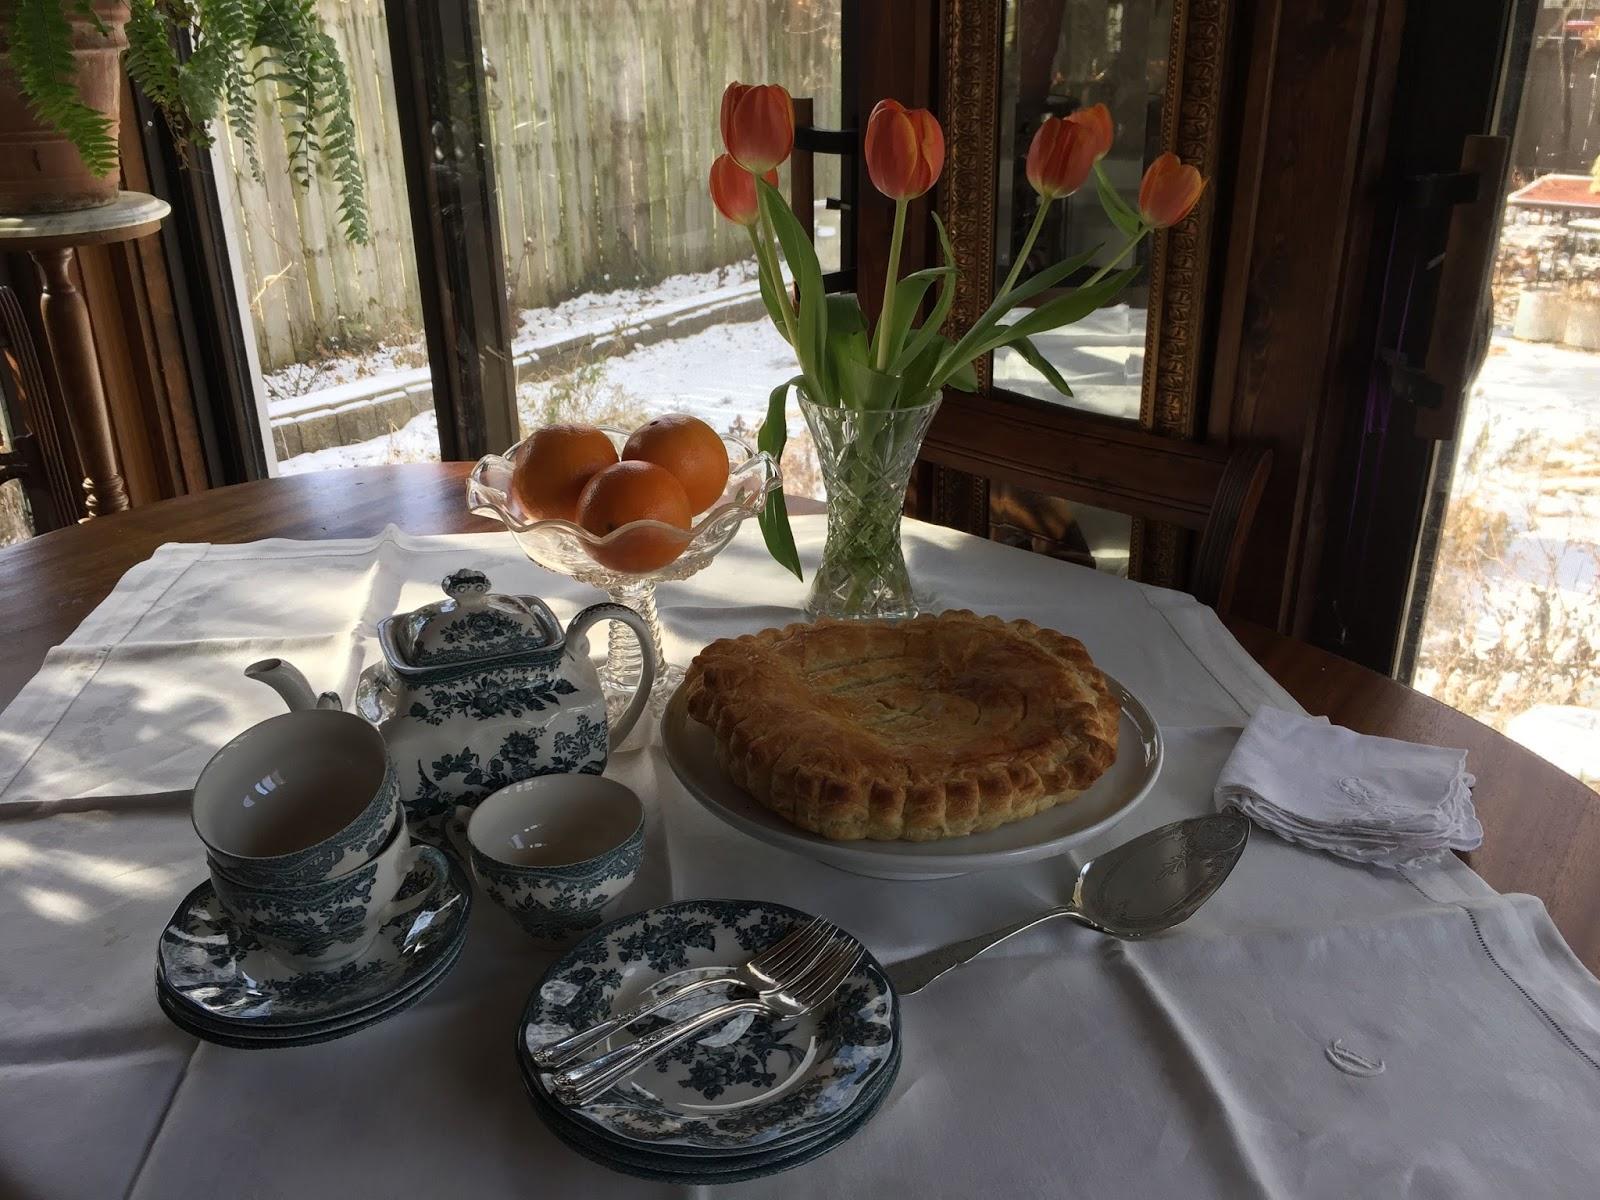 Is Tea Cake A Christ Figure